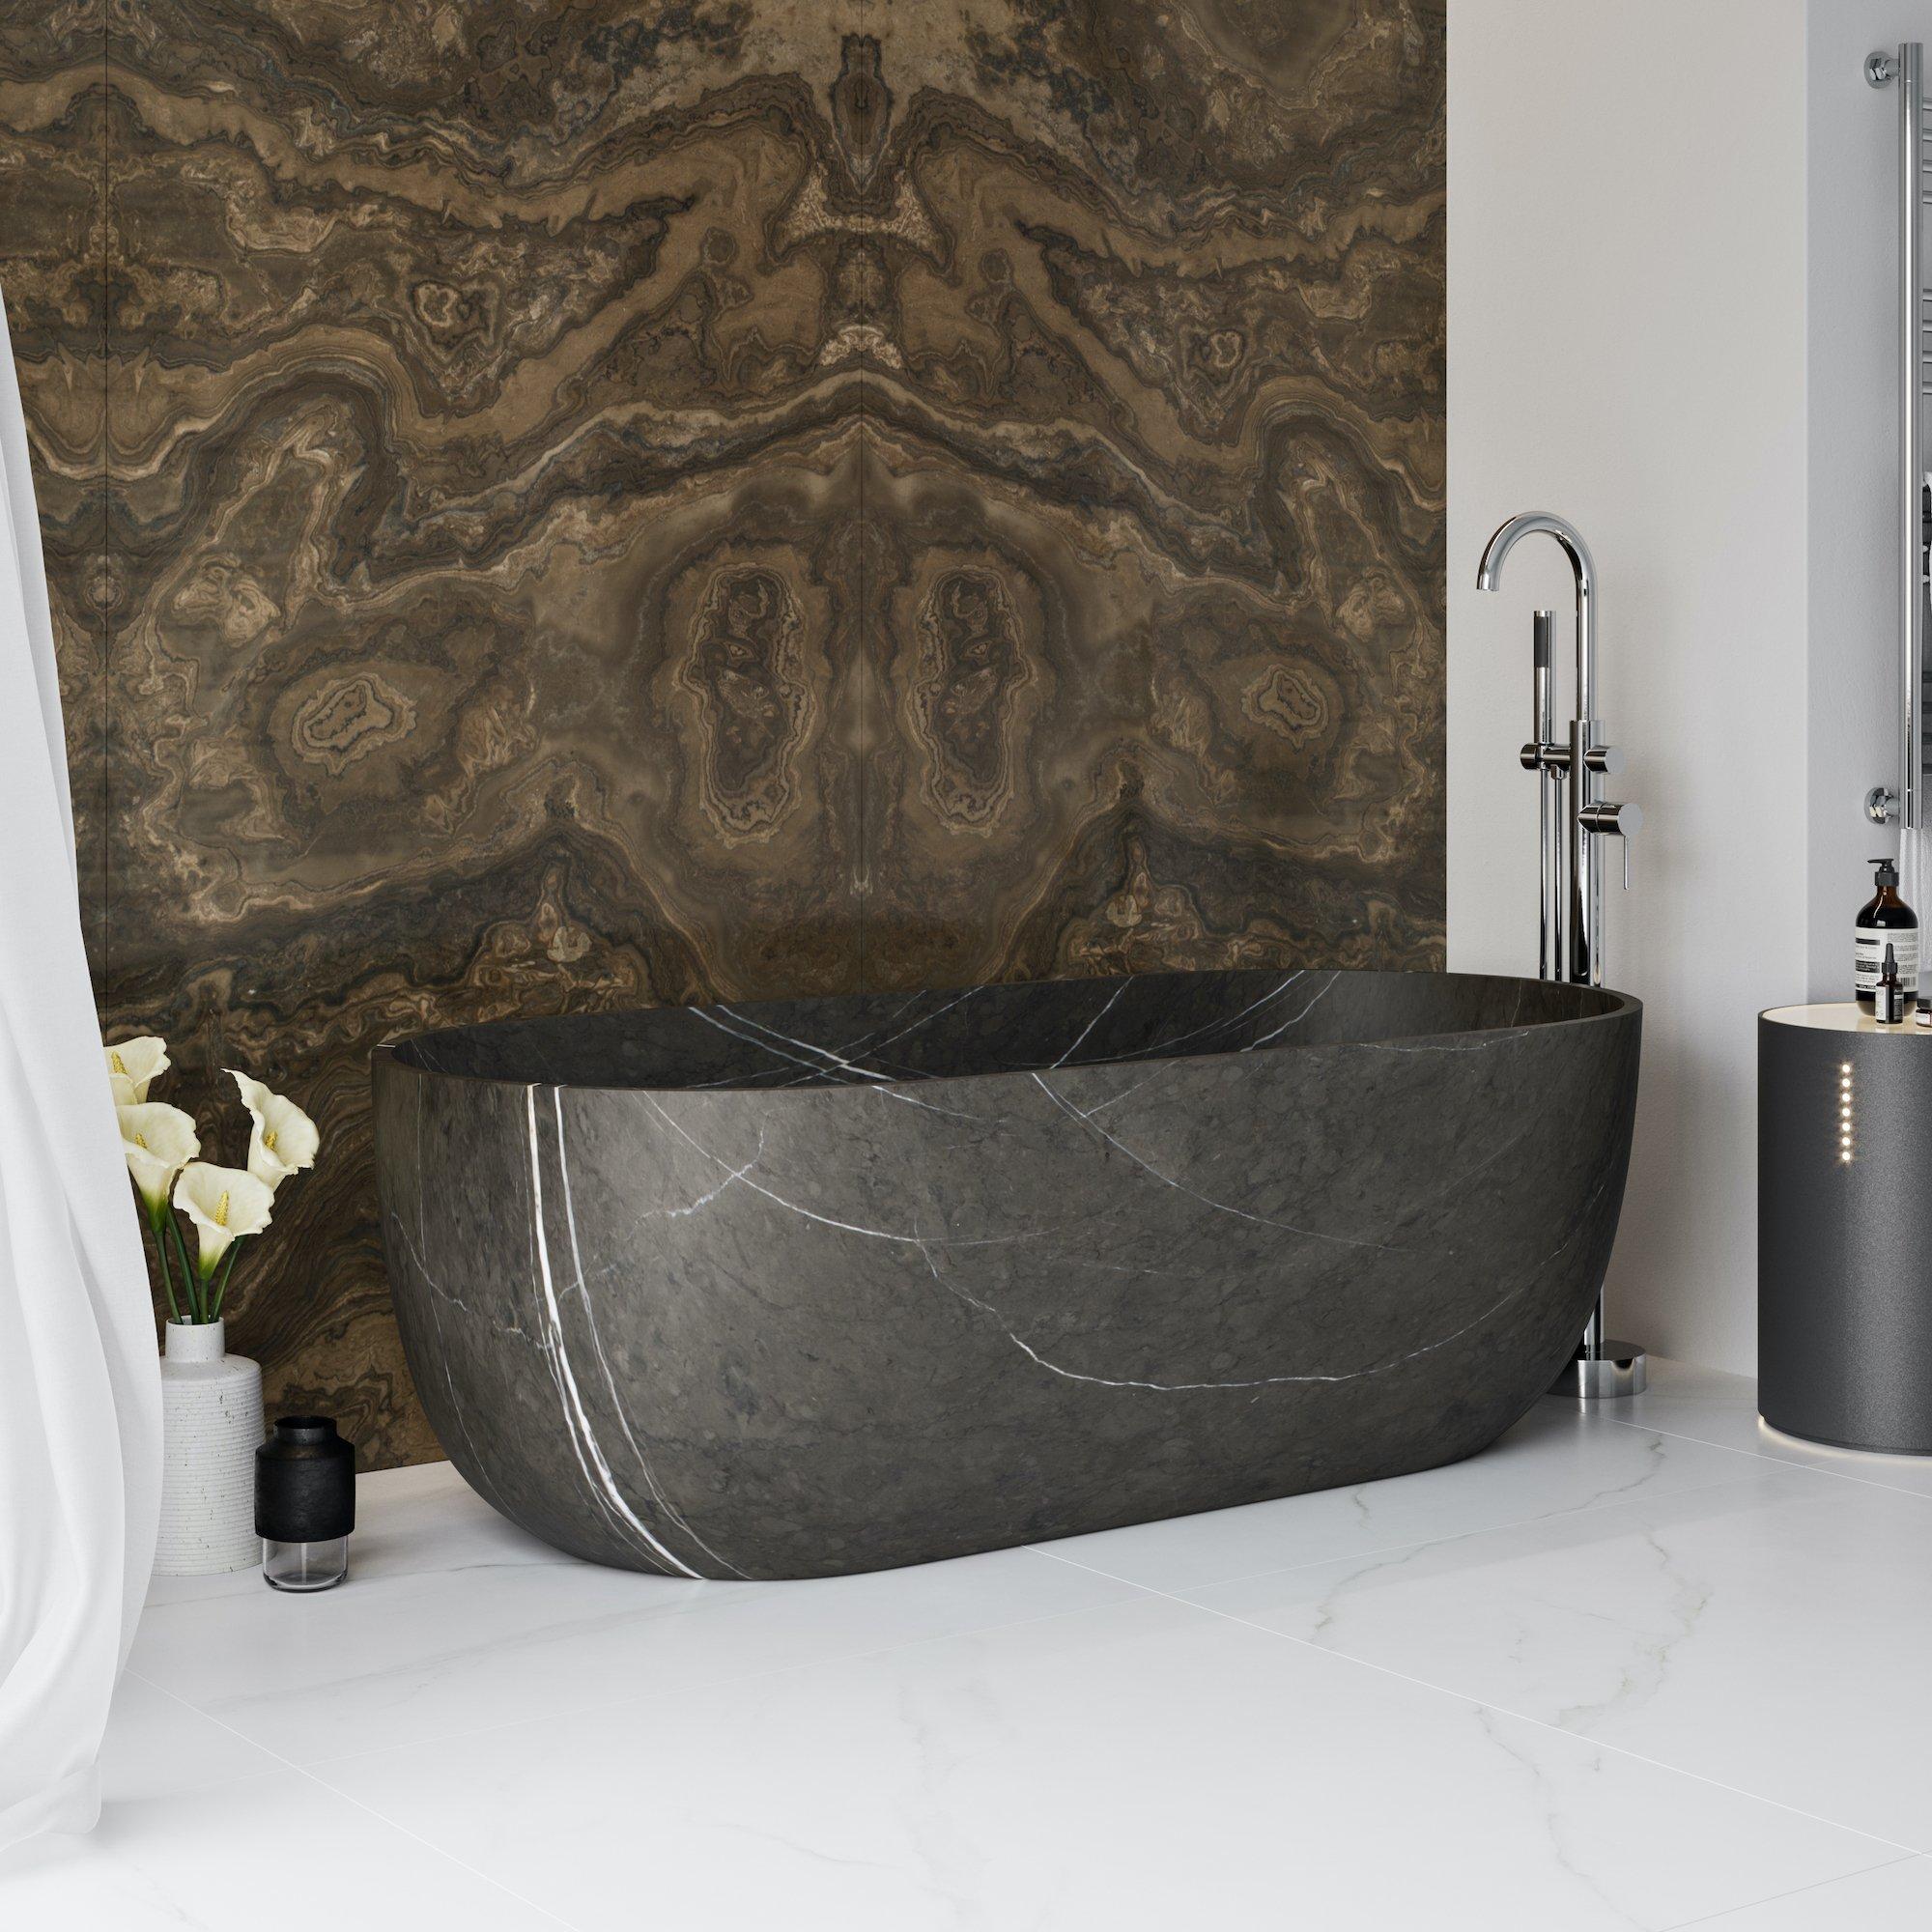 A single-piece marble bathtub – the last word in luxury